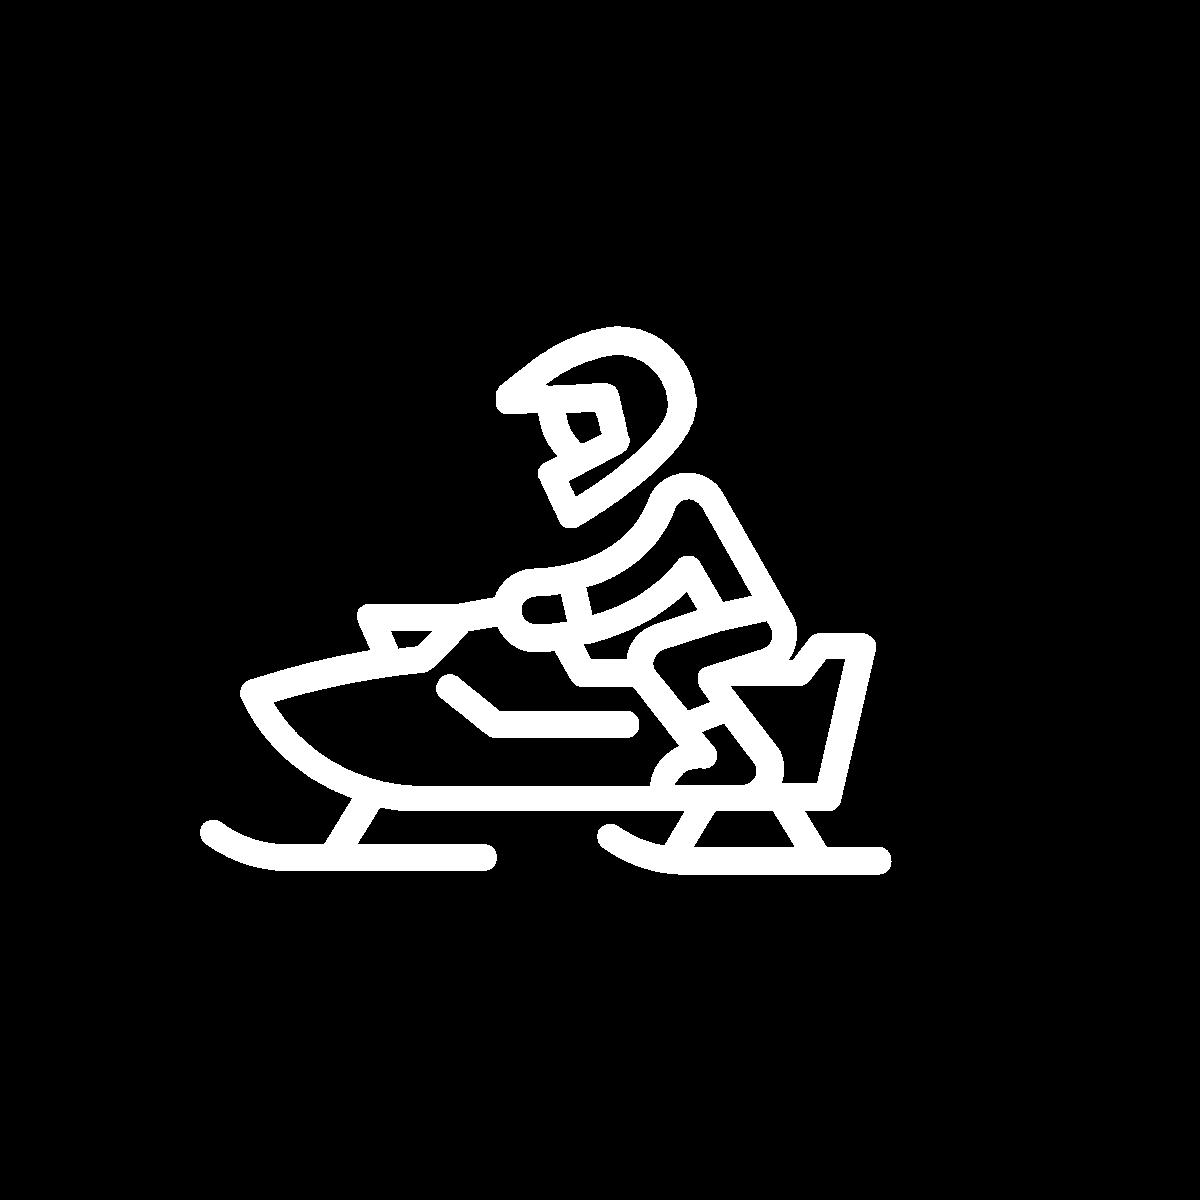 snow mobile icon